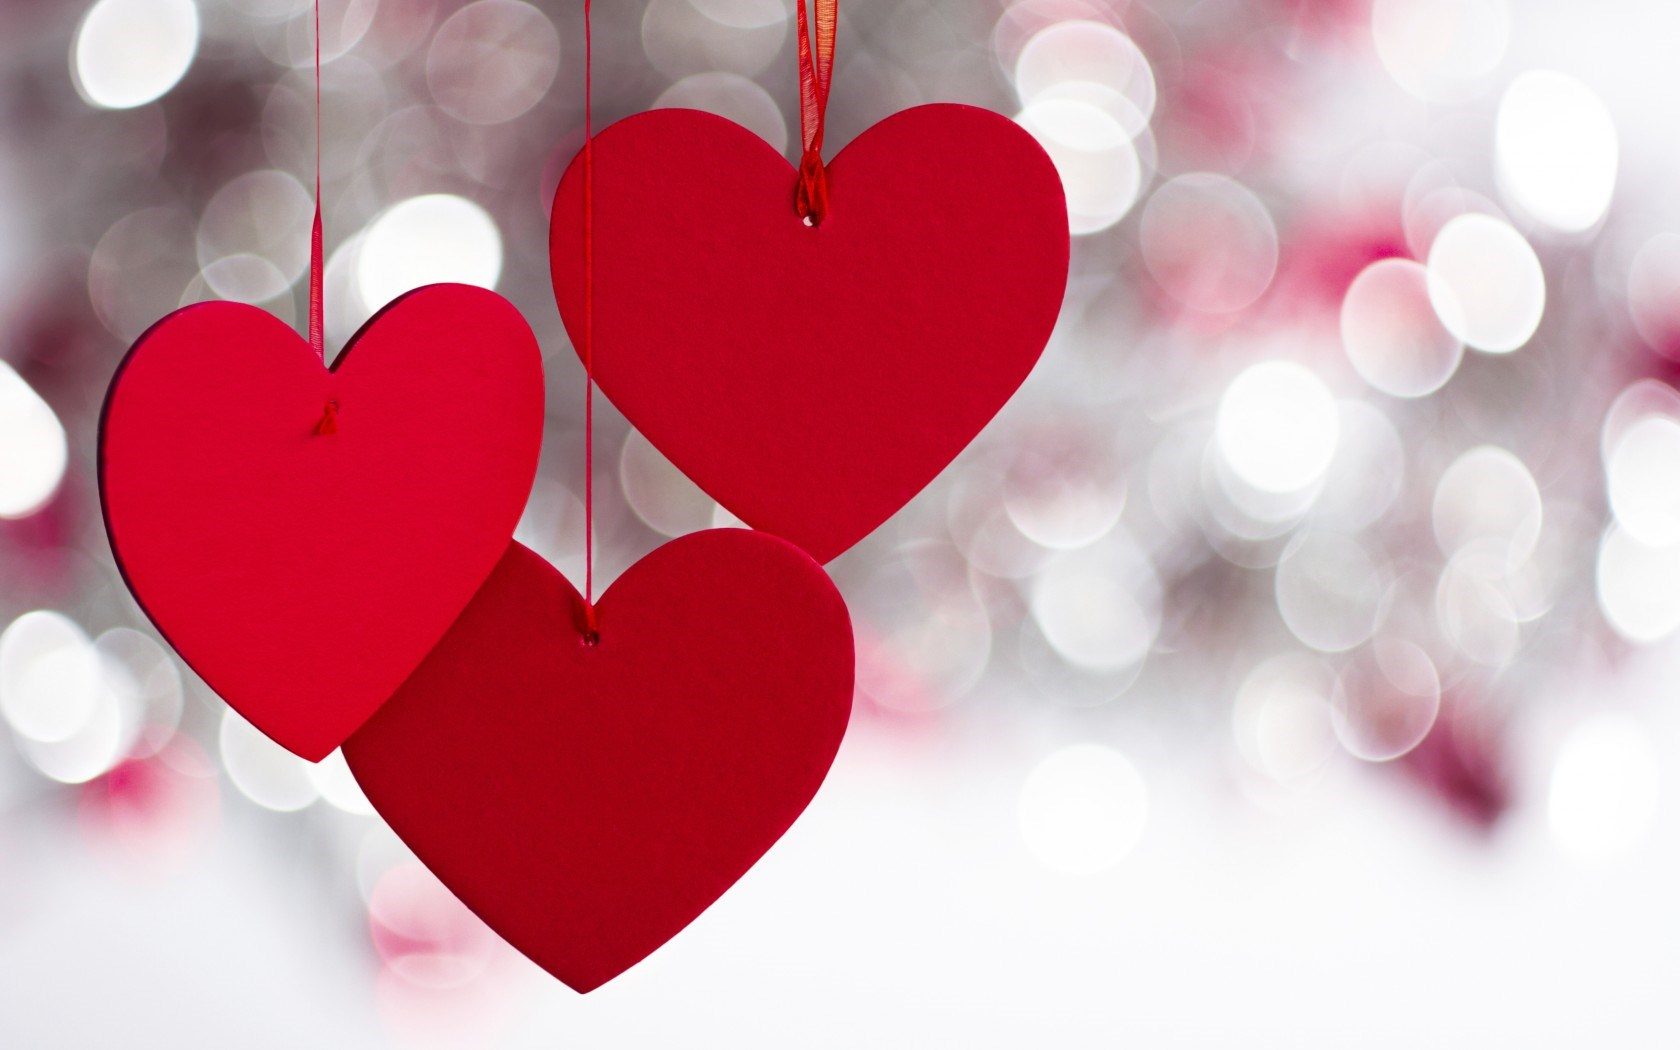 Creative-Love-HD-Wallpaper For Iphone